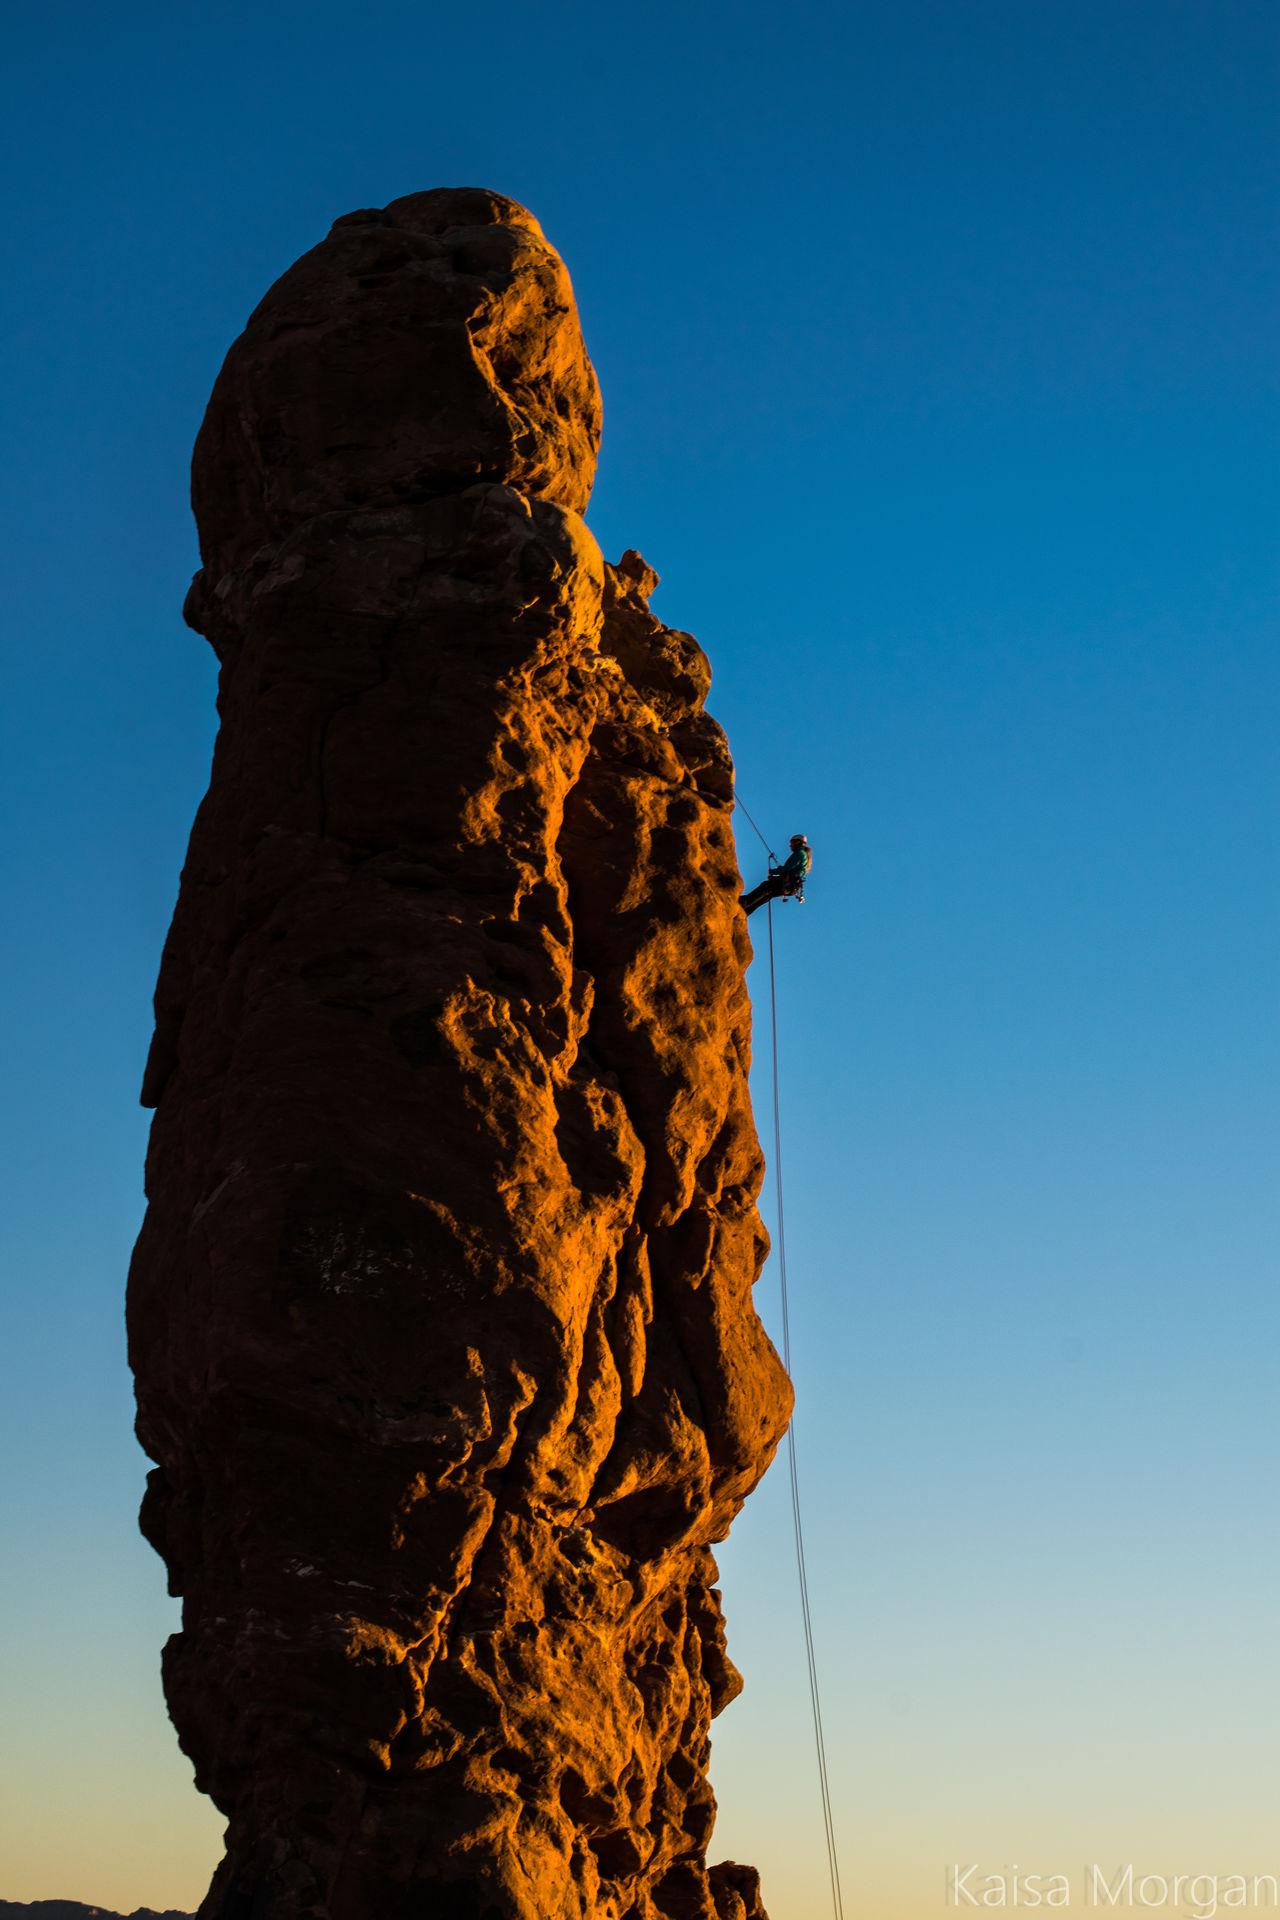 Adrenaline Junkie Adventure Arches National Park, Utah Climb Climbing Cloud - Sky Danger Extreme Sports Landscape Nature Outdoors Rock Rock Climbing RockClimbing Ropes Sculpture Sky Strength Travel